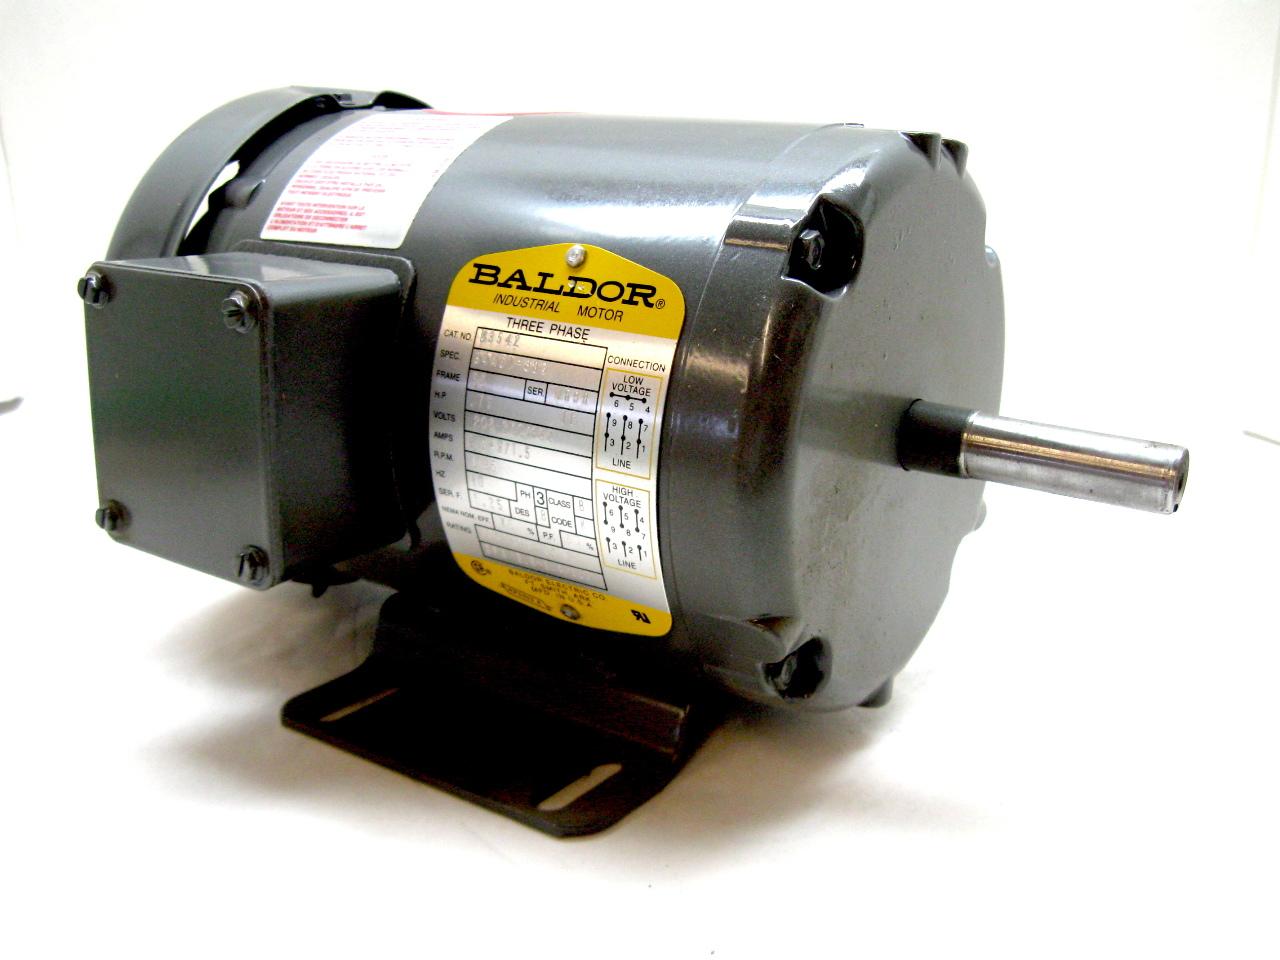 Baldor M3542 Three Phase Enclosed Motor 75 Hp 1725 Rpm 208 230 460v New Ebay